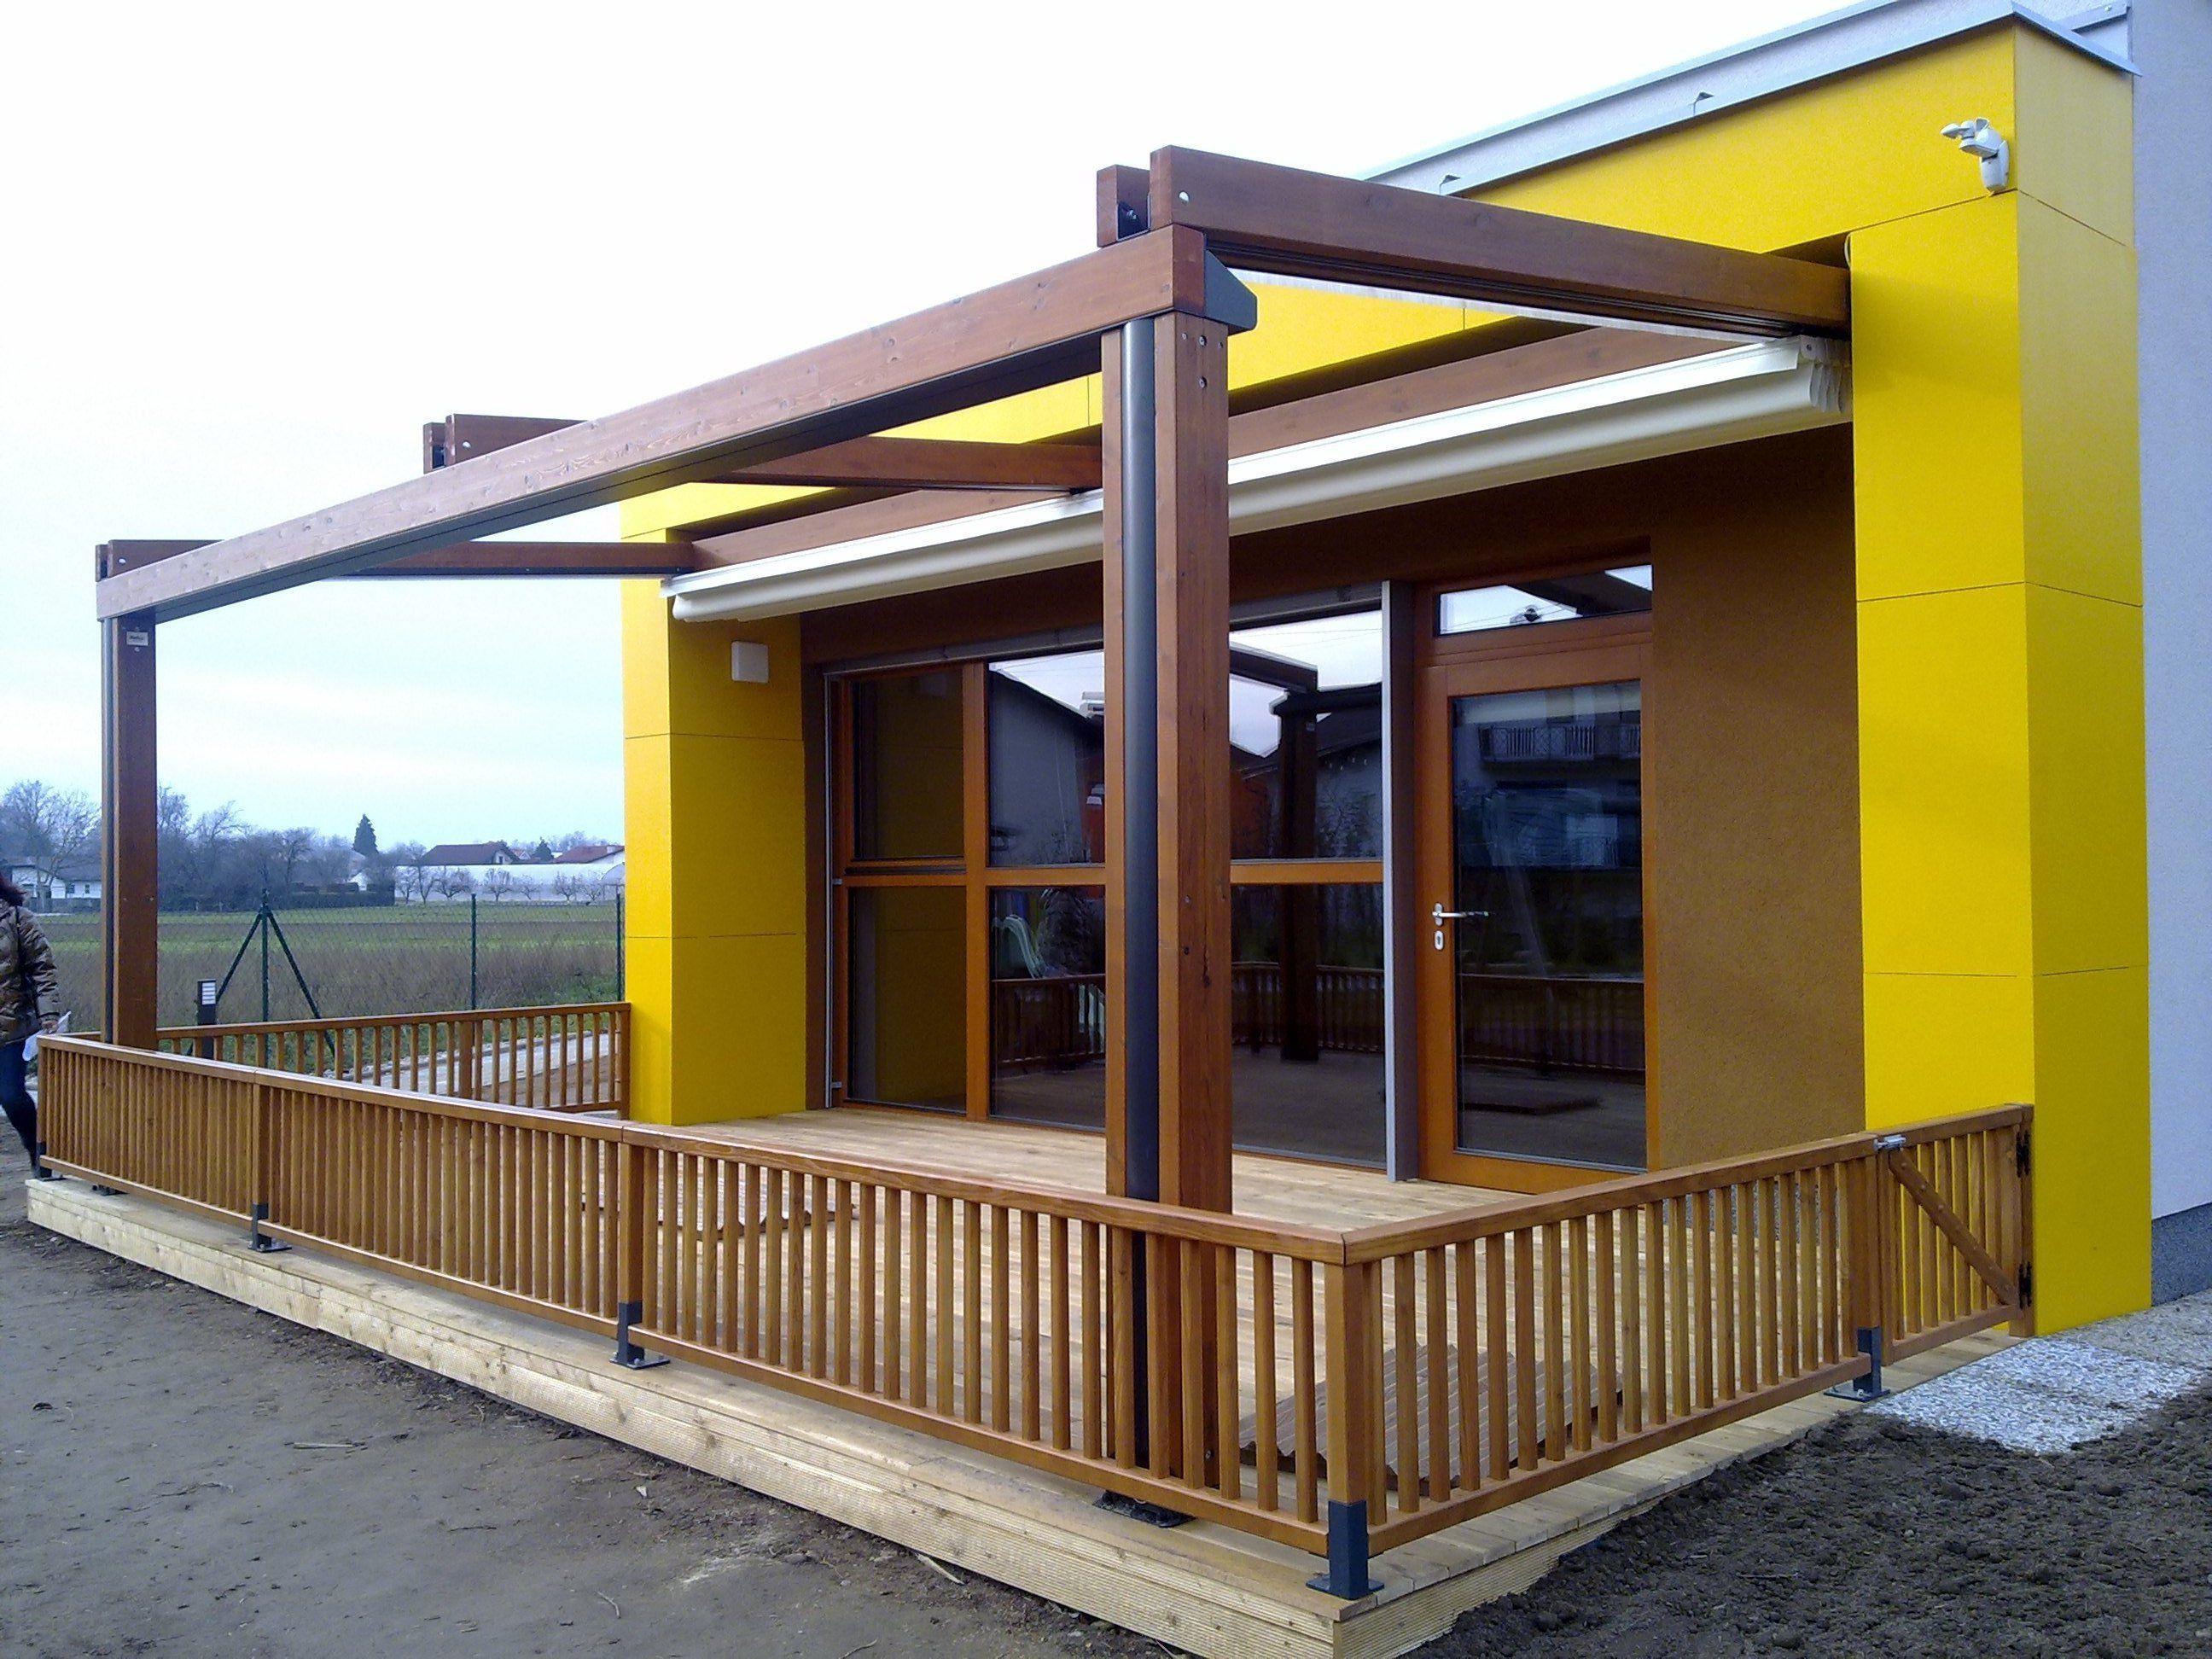 Pergole Din Lemn Elite Pergole Pavilion Gibus Cu Structura Lemn Acoperis Retractabil Si Sistem De Drenare Integrat I Pergola Outdoor Decor Outdoor Structures